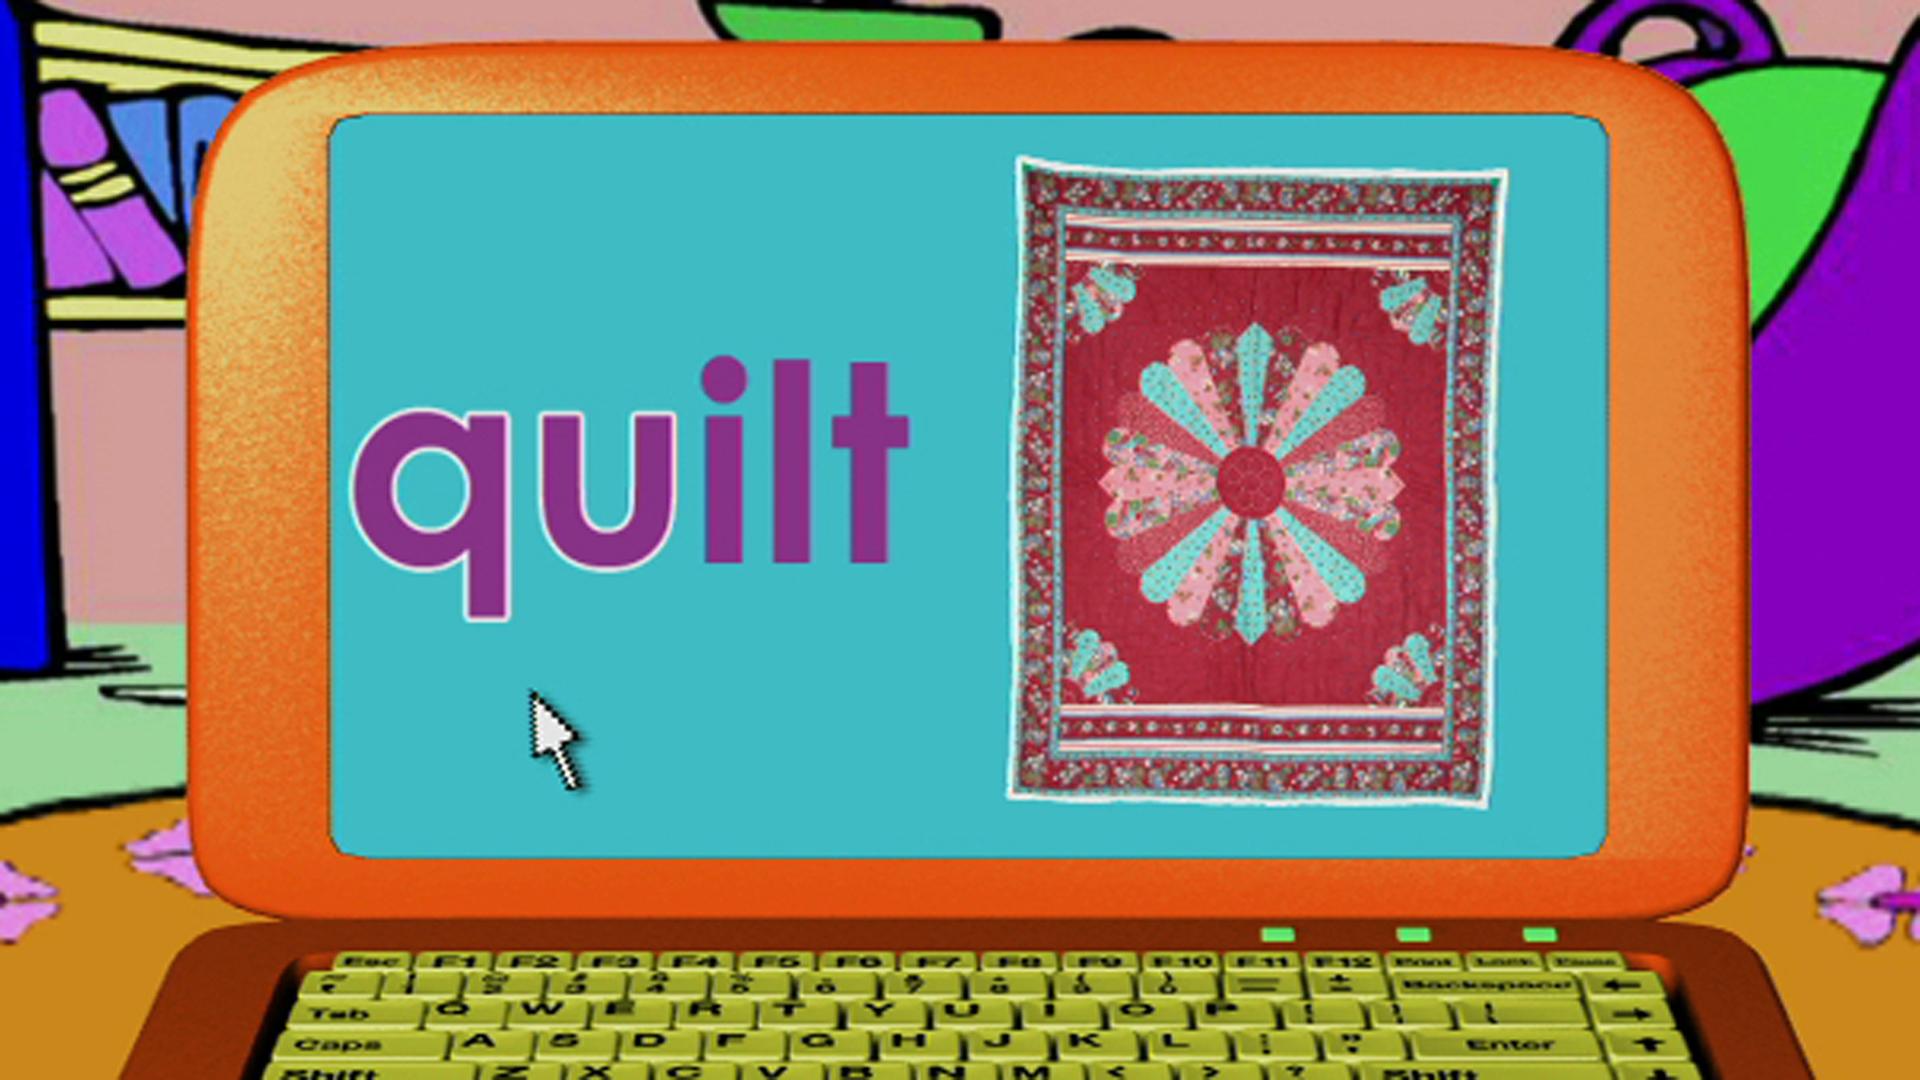 Watch Word Morph: quarter-quail-quill-quilt